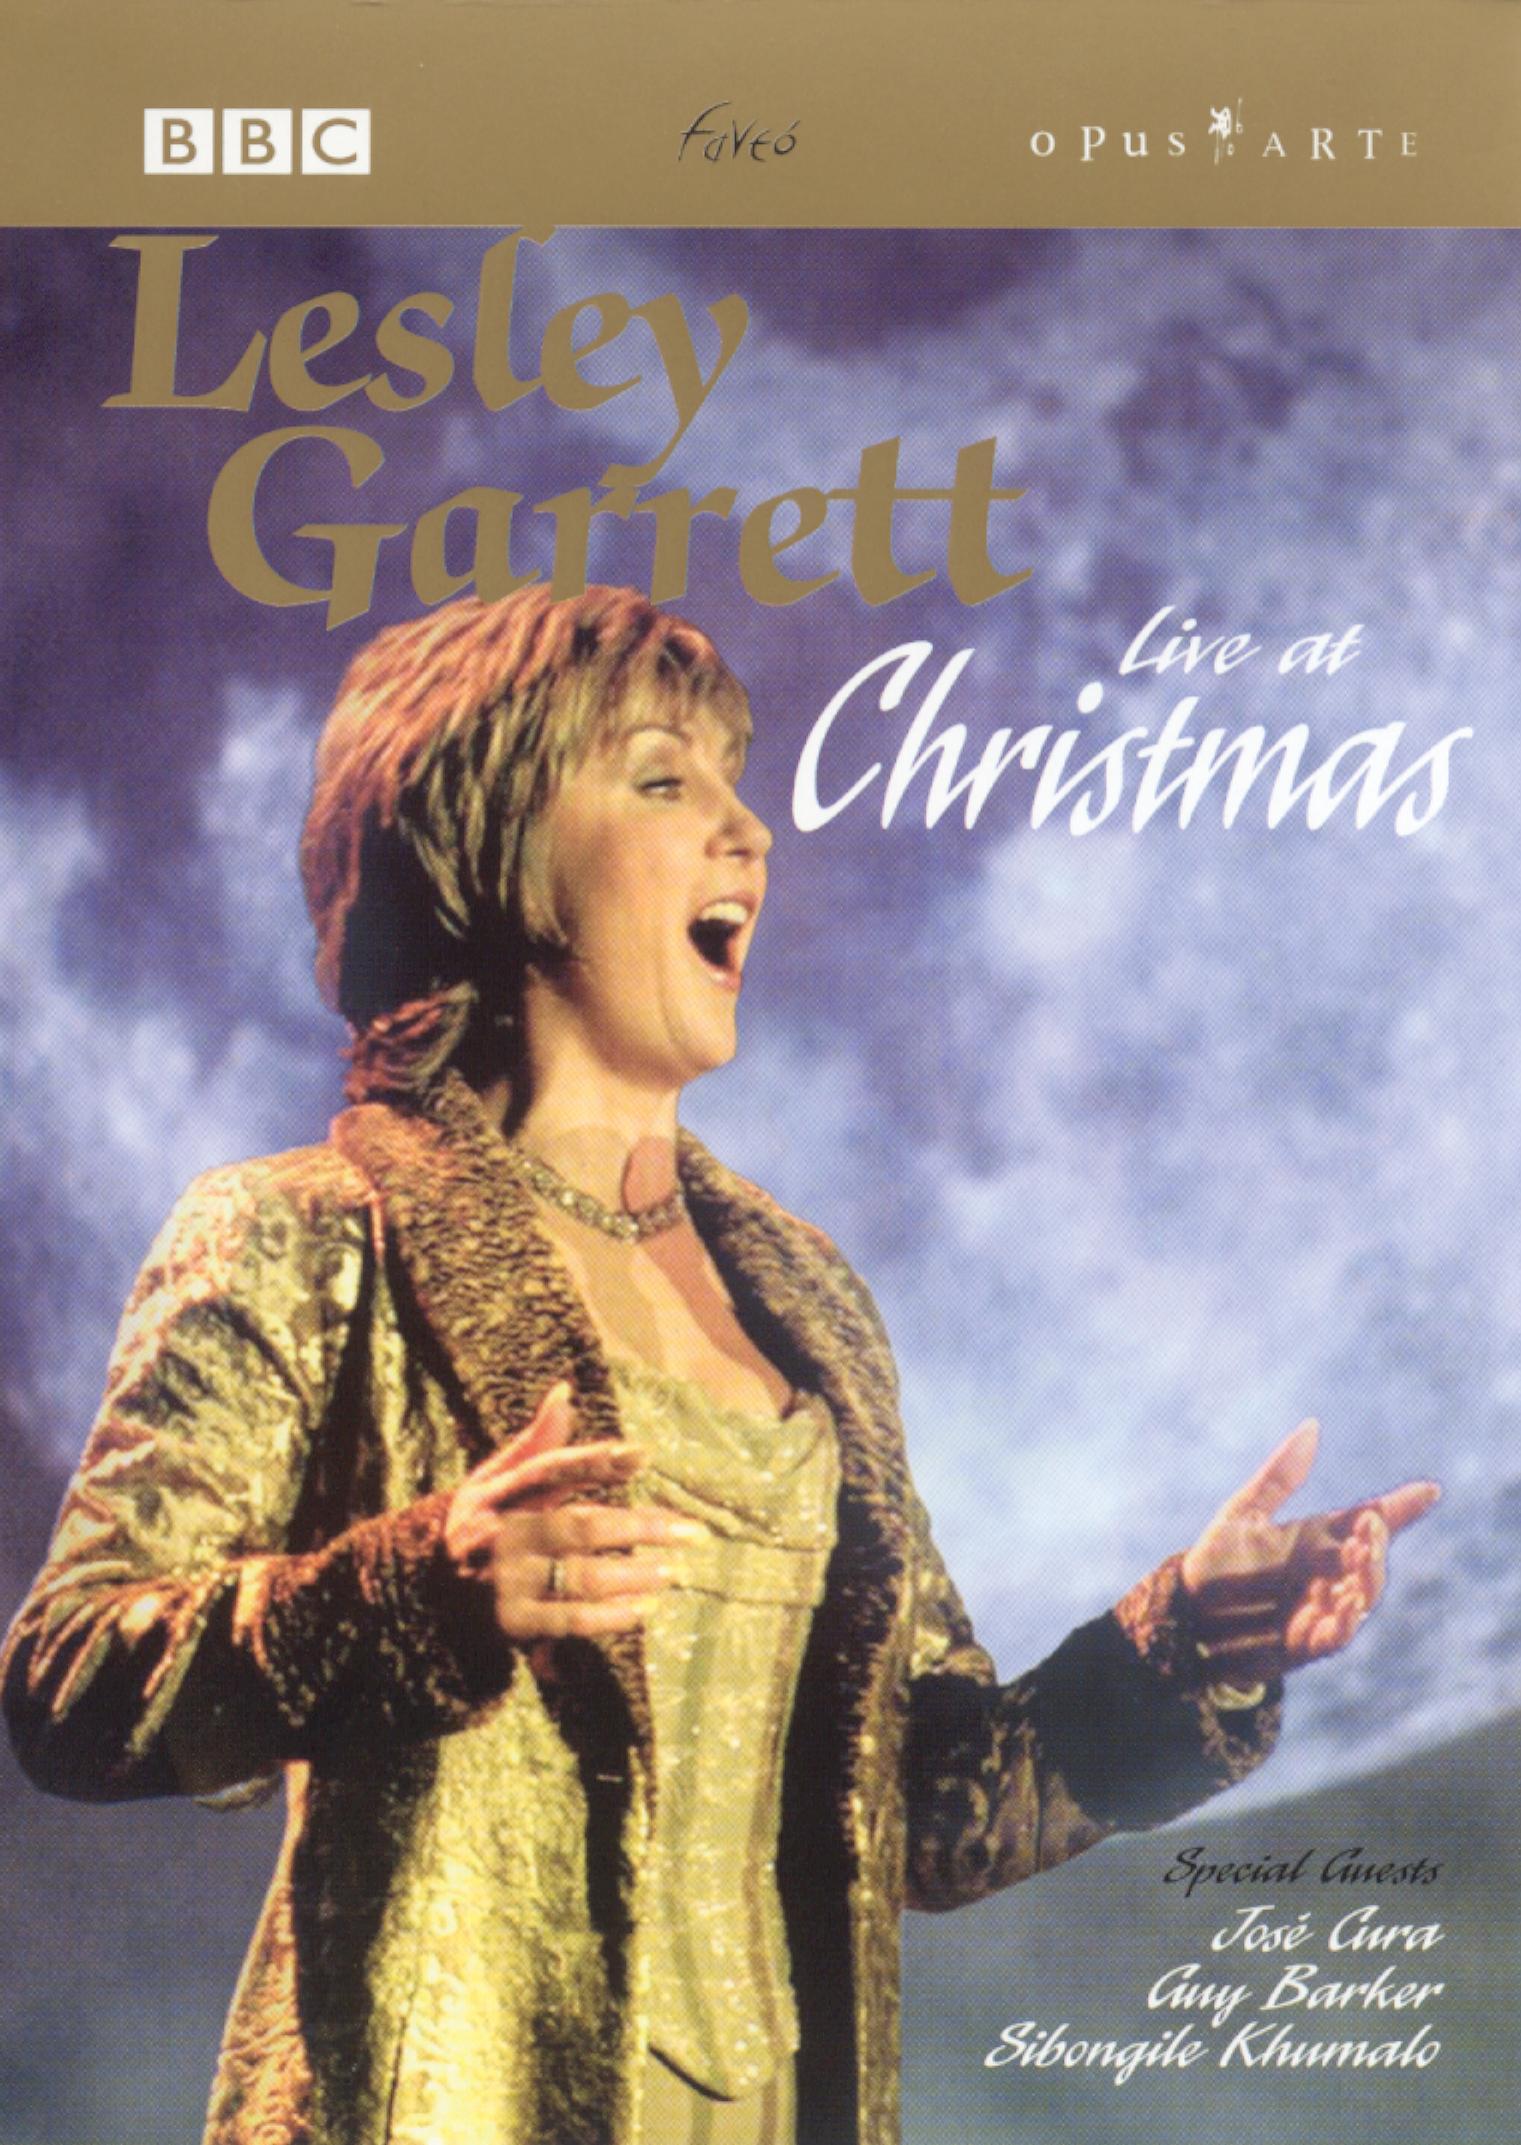 Lesley Garrett: Live at Christmas